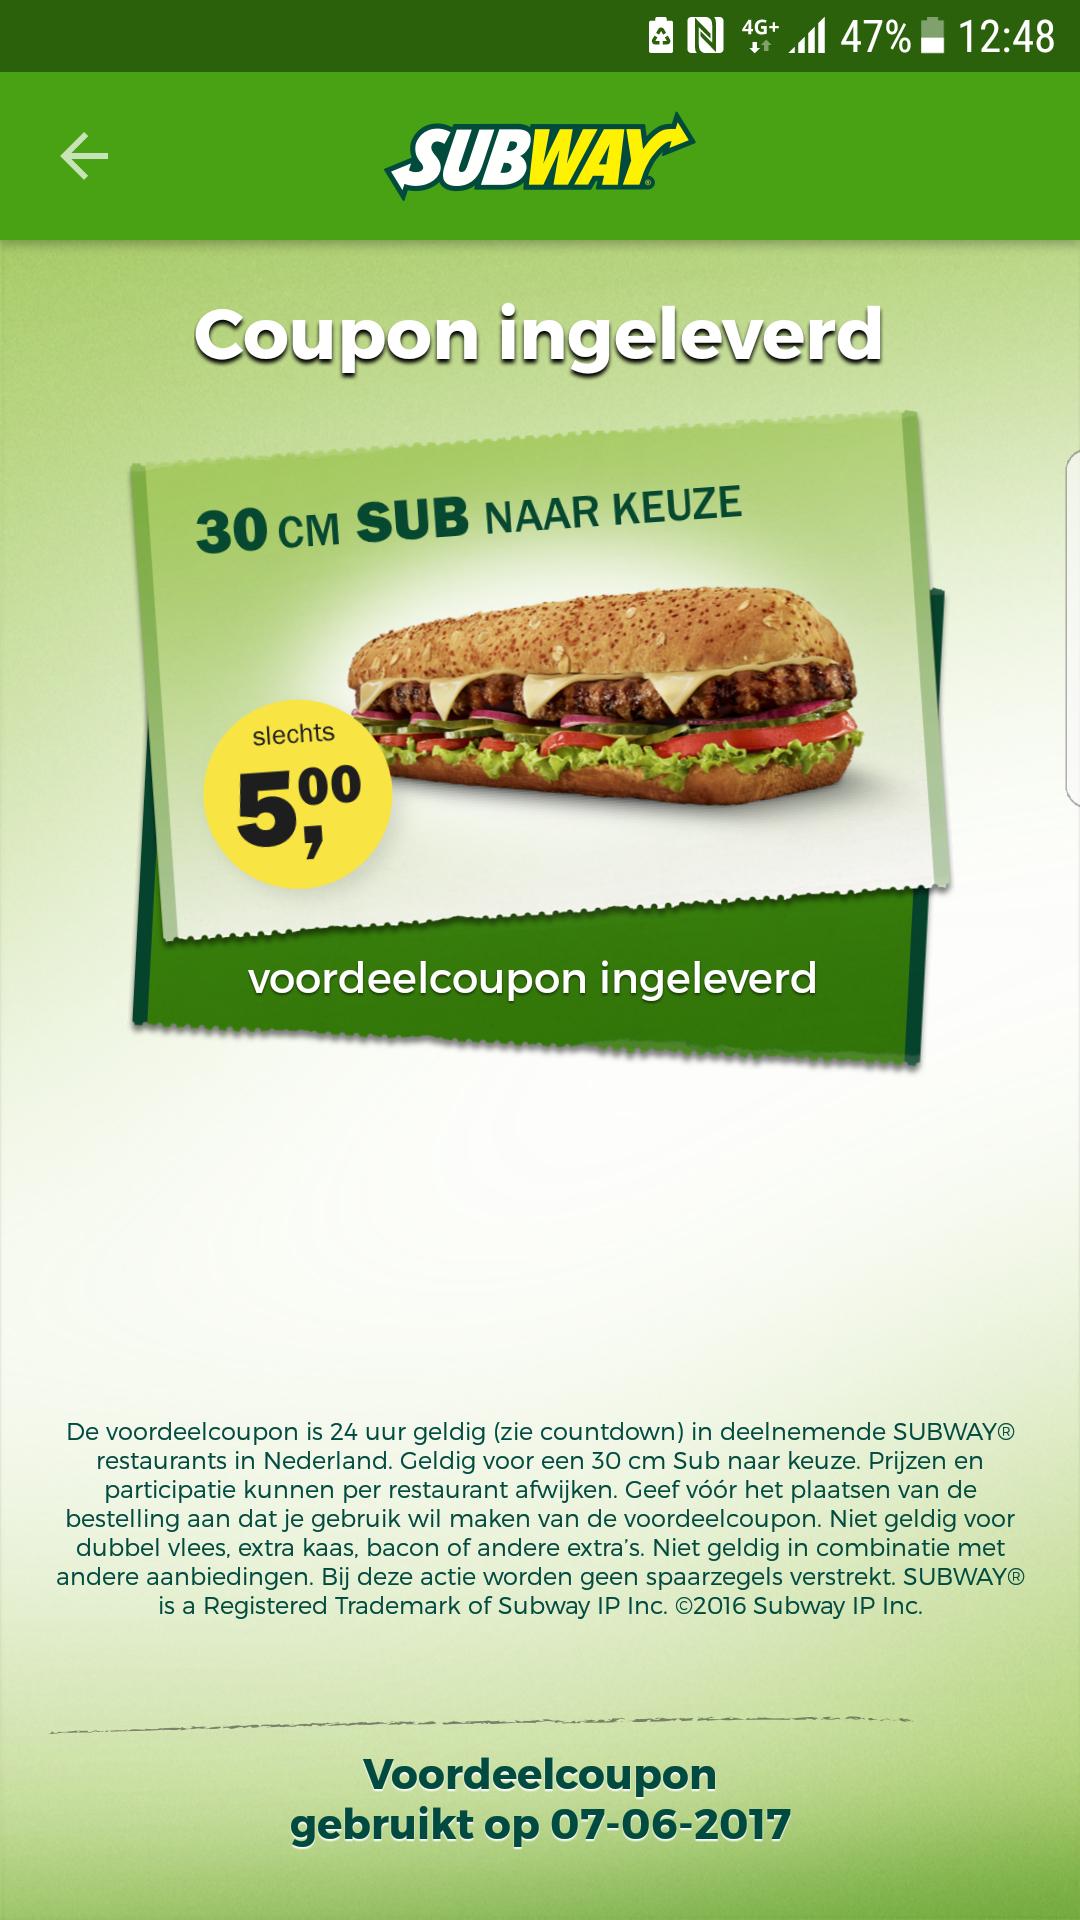 Sub naar keuze 30 cm @ Subway